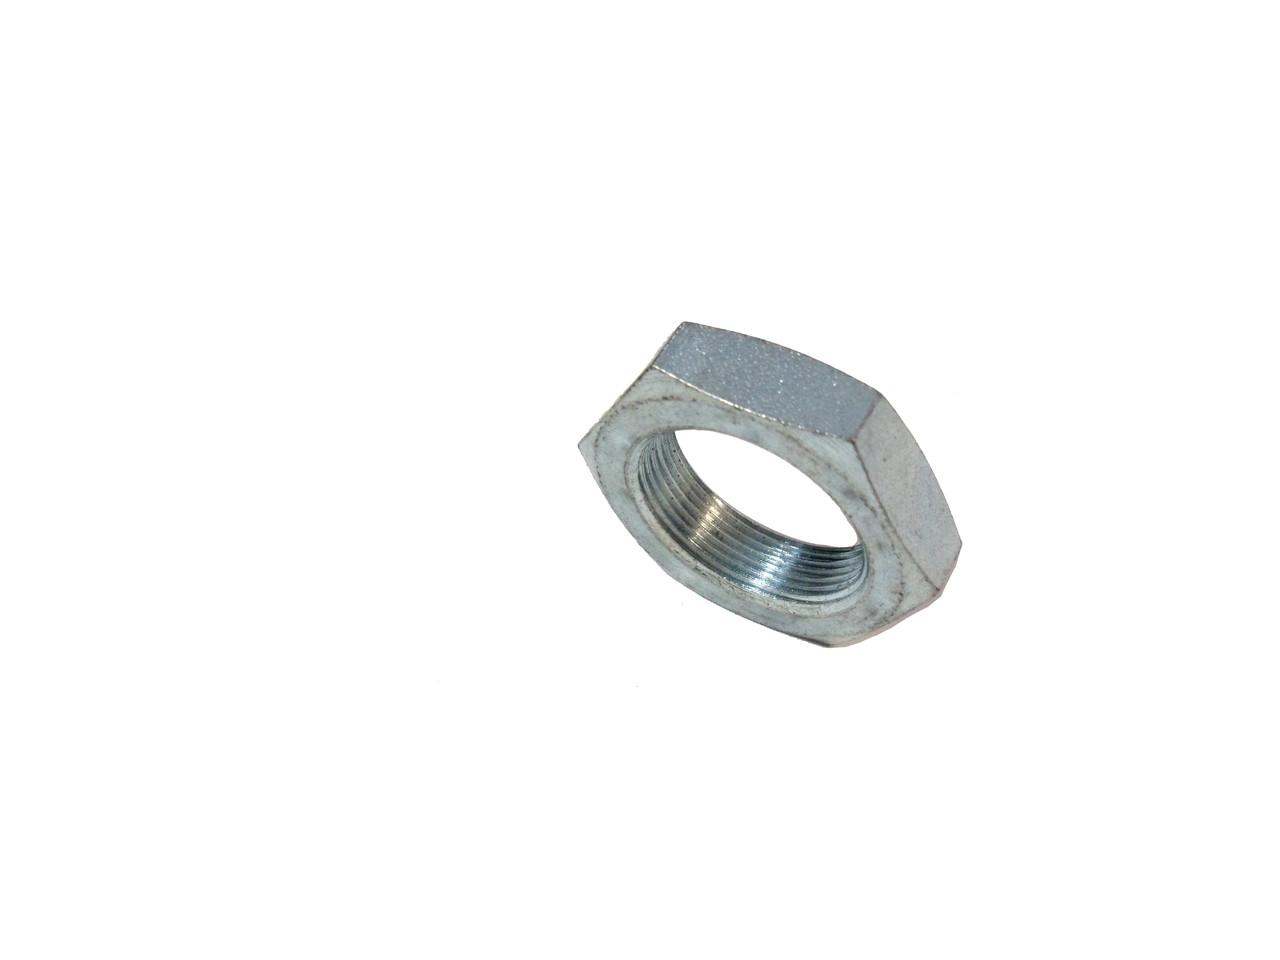 Tomos A35 A55 M22 x 1 Front Sprocket Nut